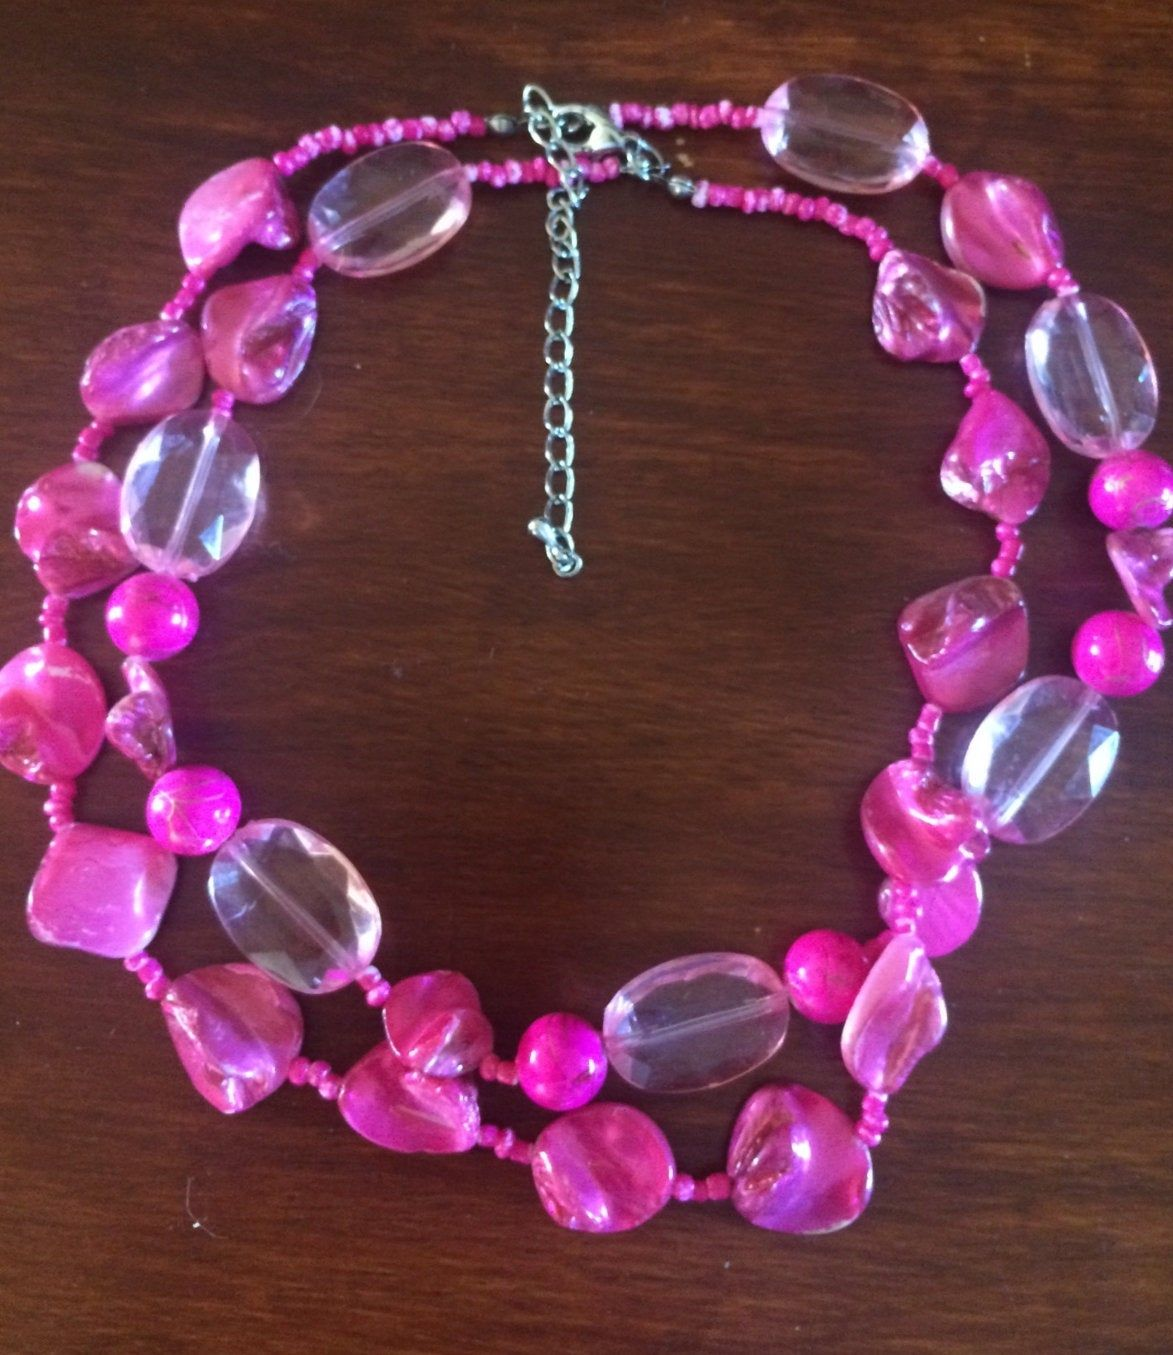 Pink Shell Beaded Twist Clasp Bracelet Costume Jewelry Fashion Accessory